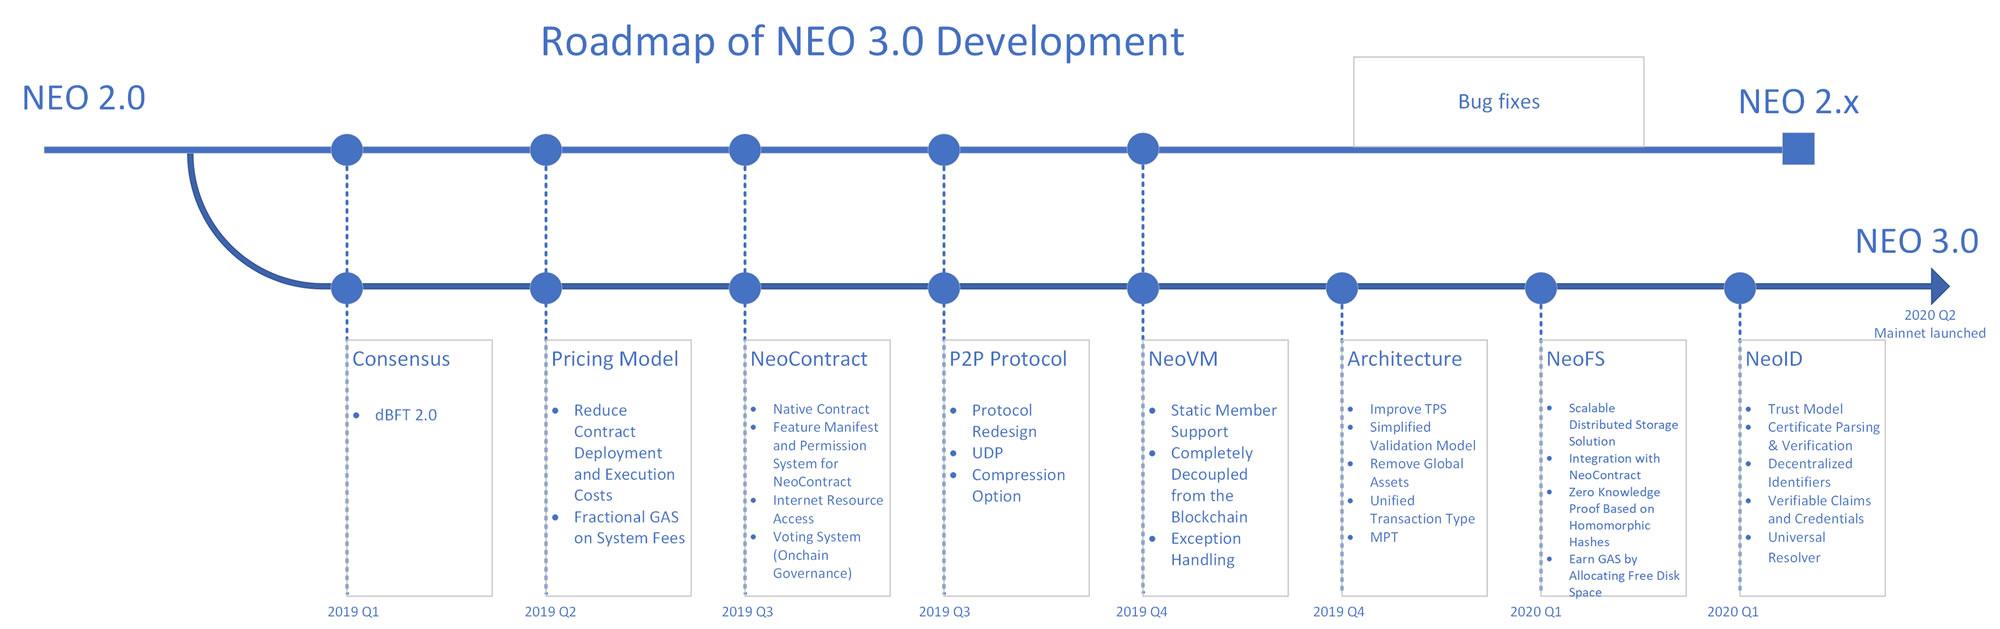 NEO 3.0 roadmap